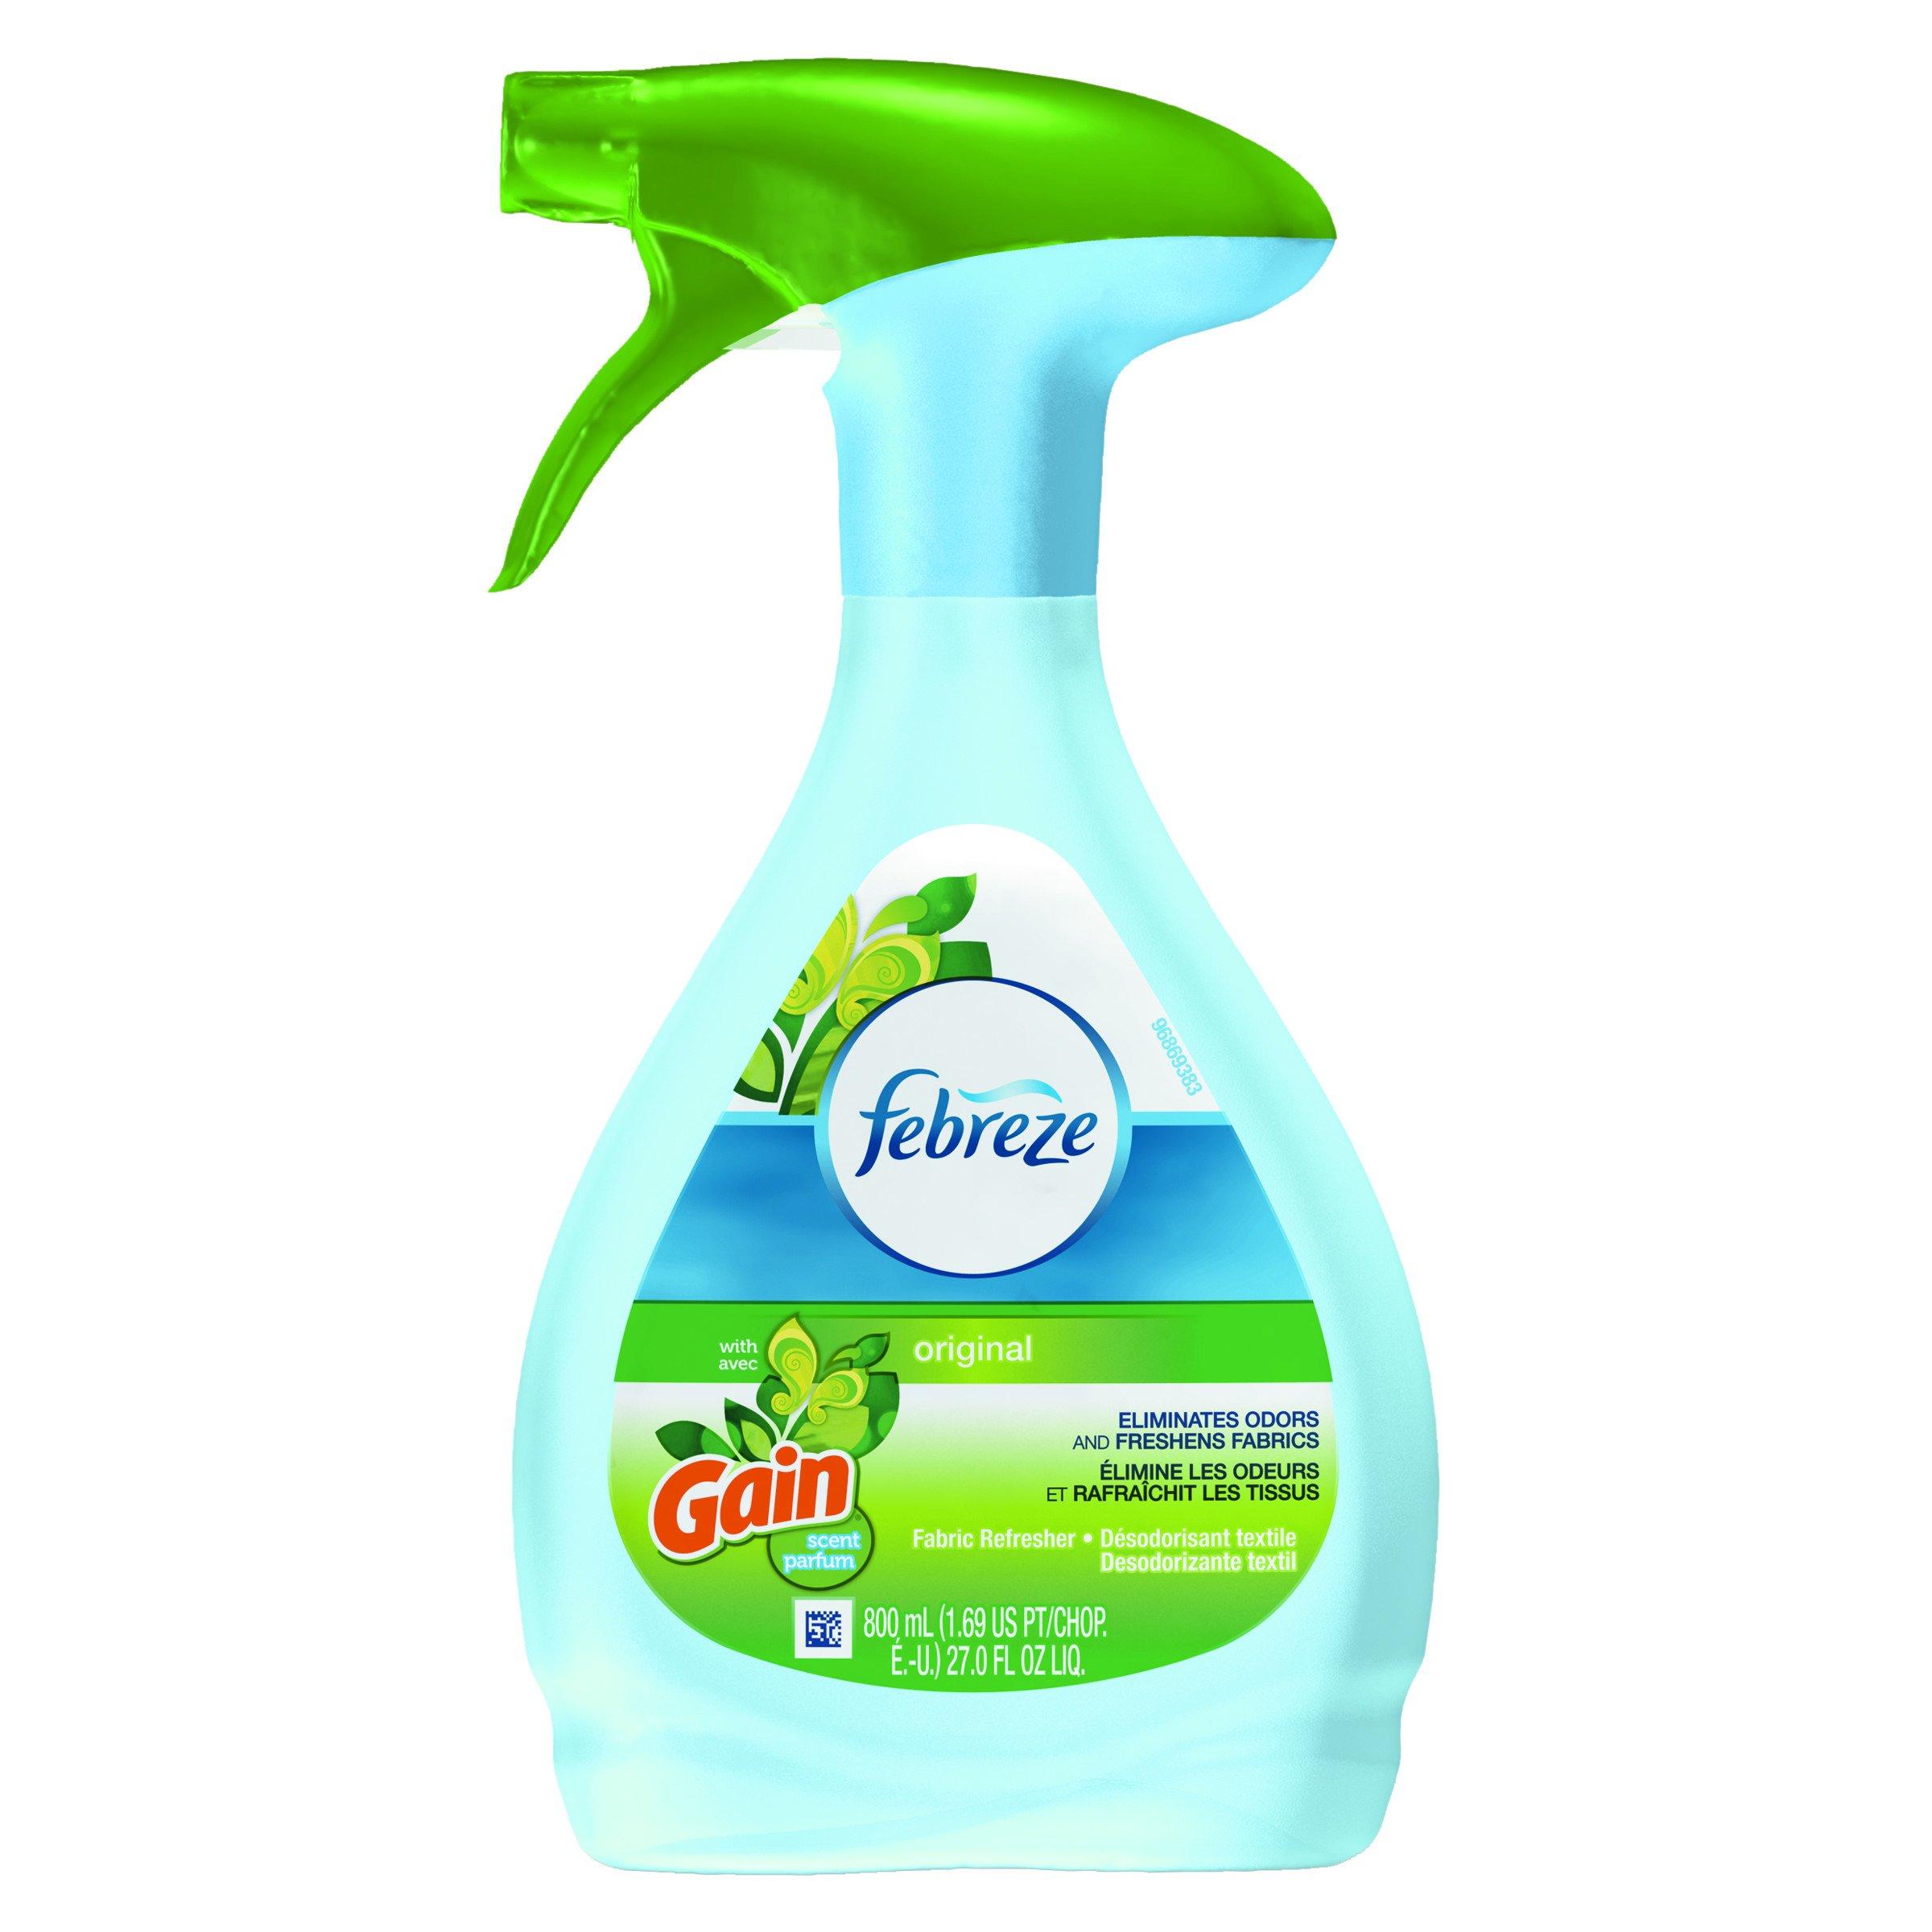 Febreze 47804CT FABRIC Refresher & Odor Eliminator, Gain Original, 27 oz Spray Bottle (Case of 6)